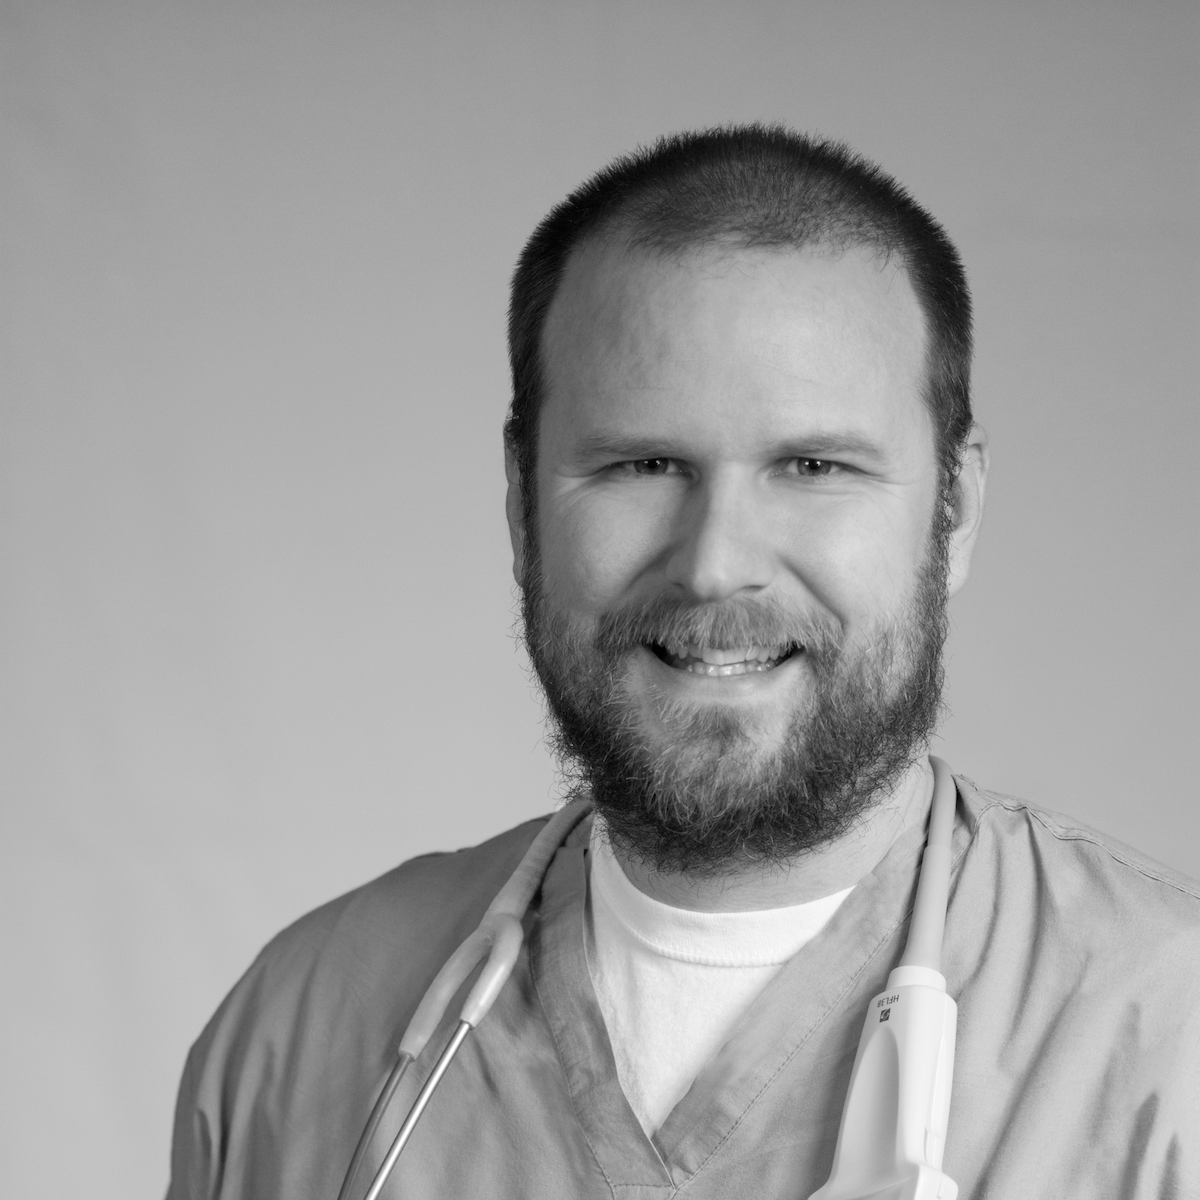 Tom Baribeault, MSN, CRNA